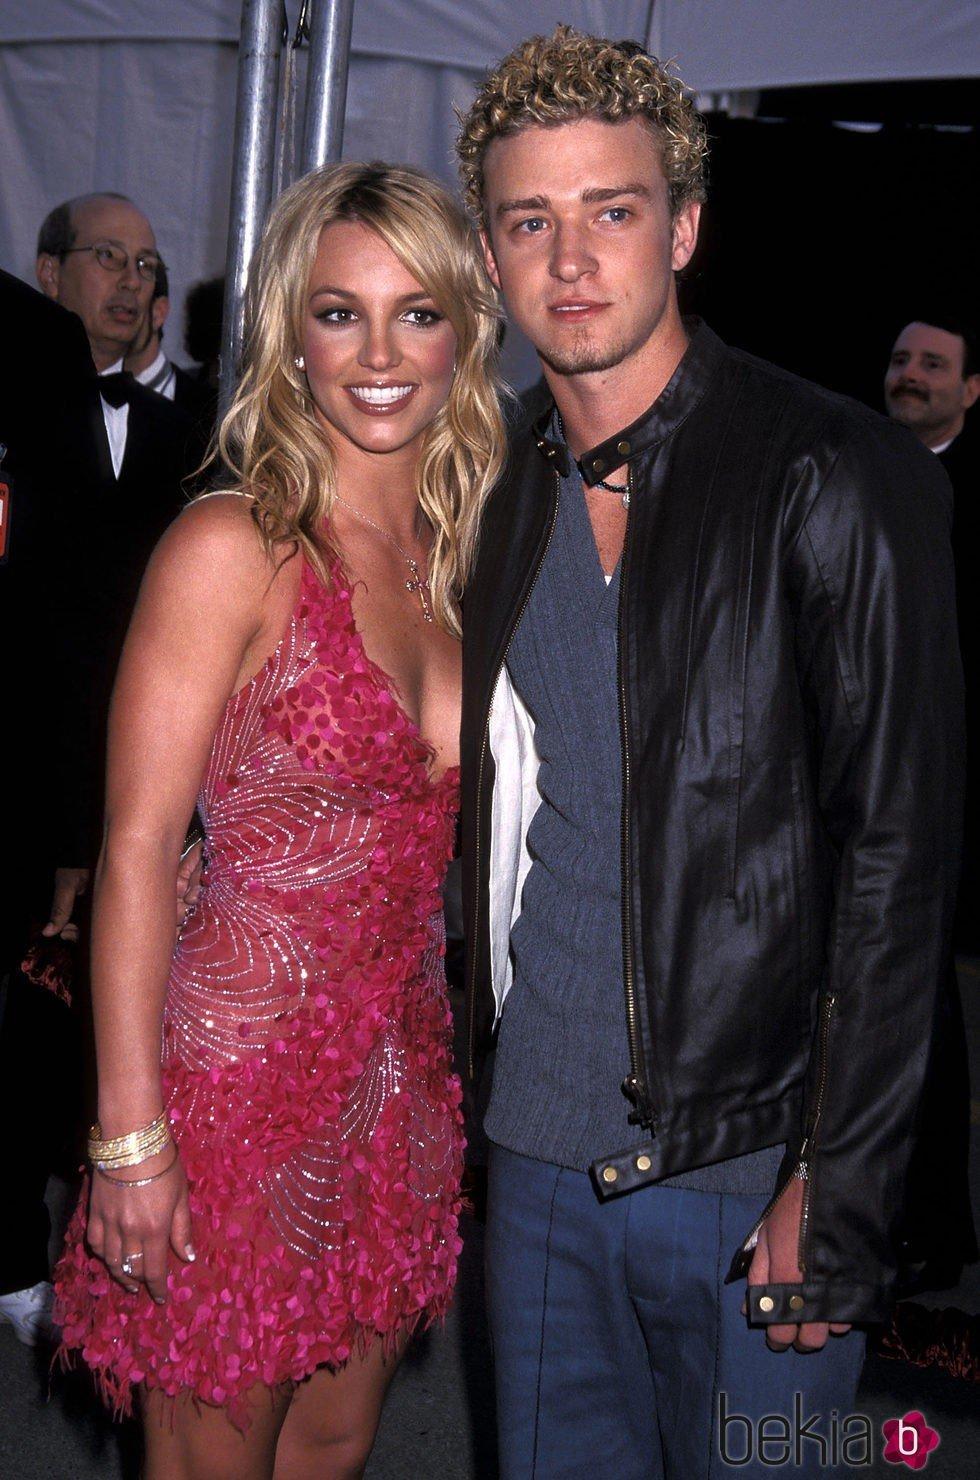 Britney Spears y Justin Timberlake - - Bekia Actualidad